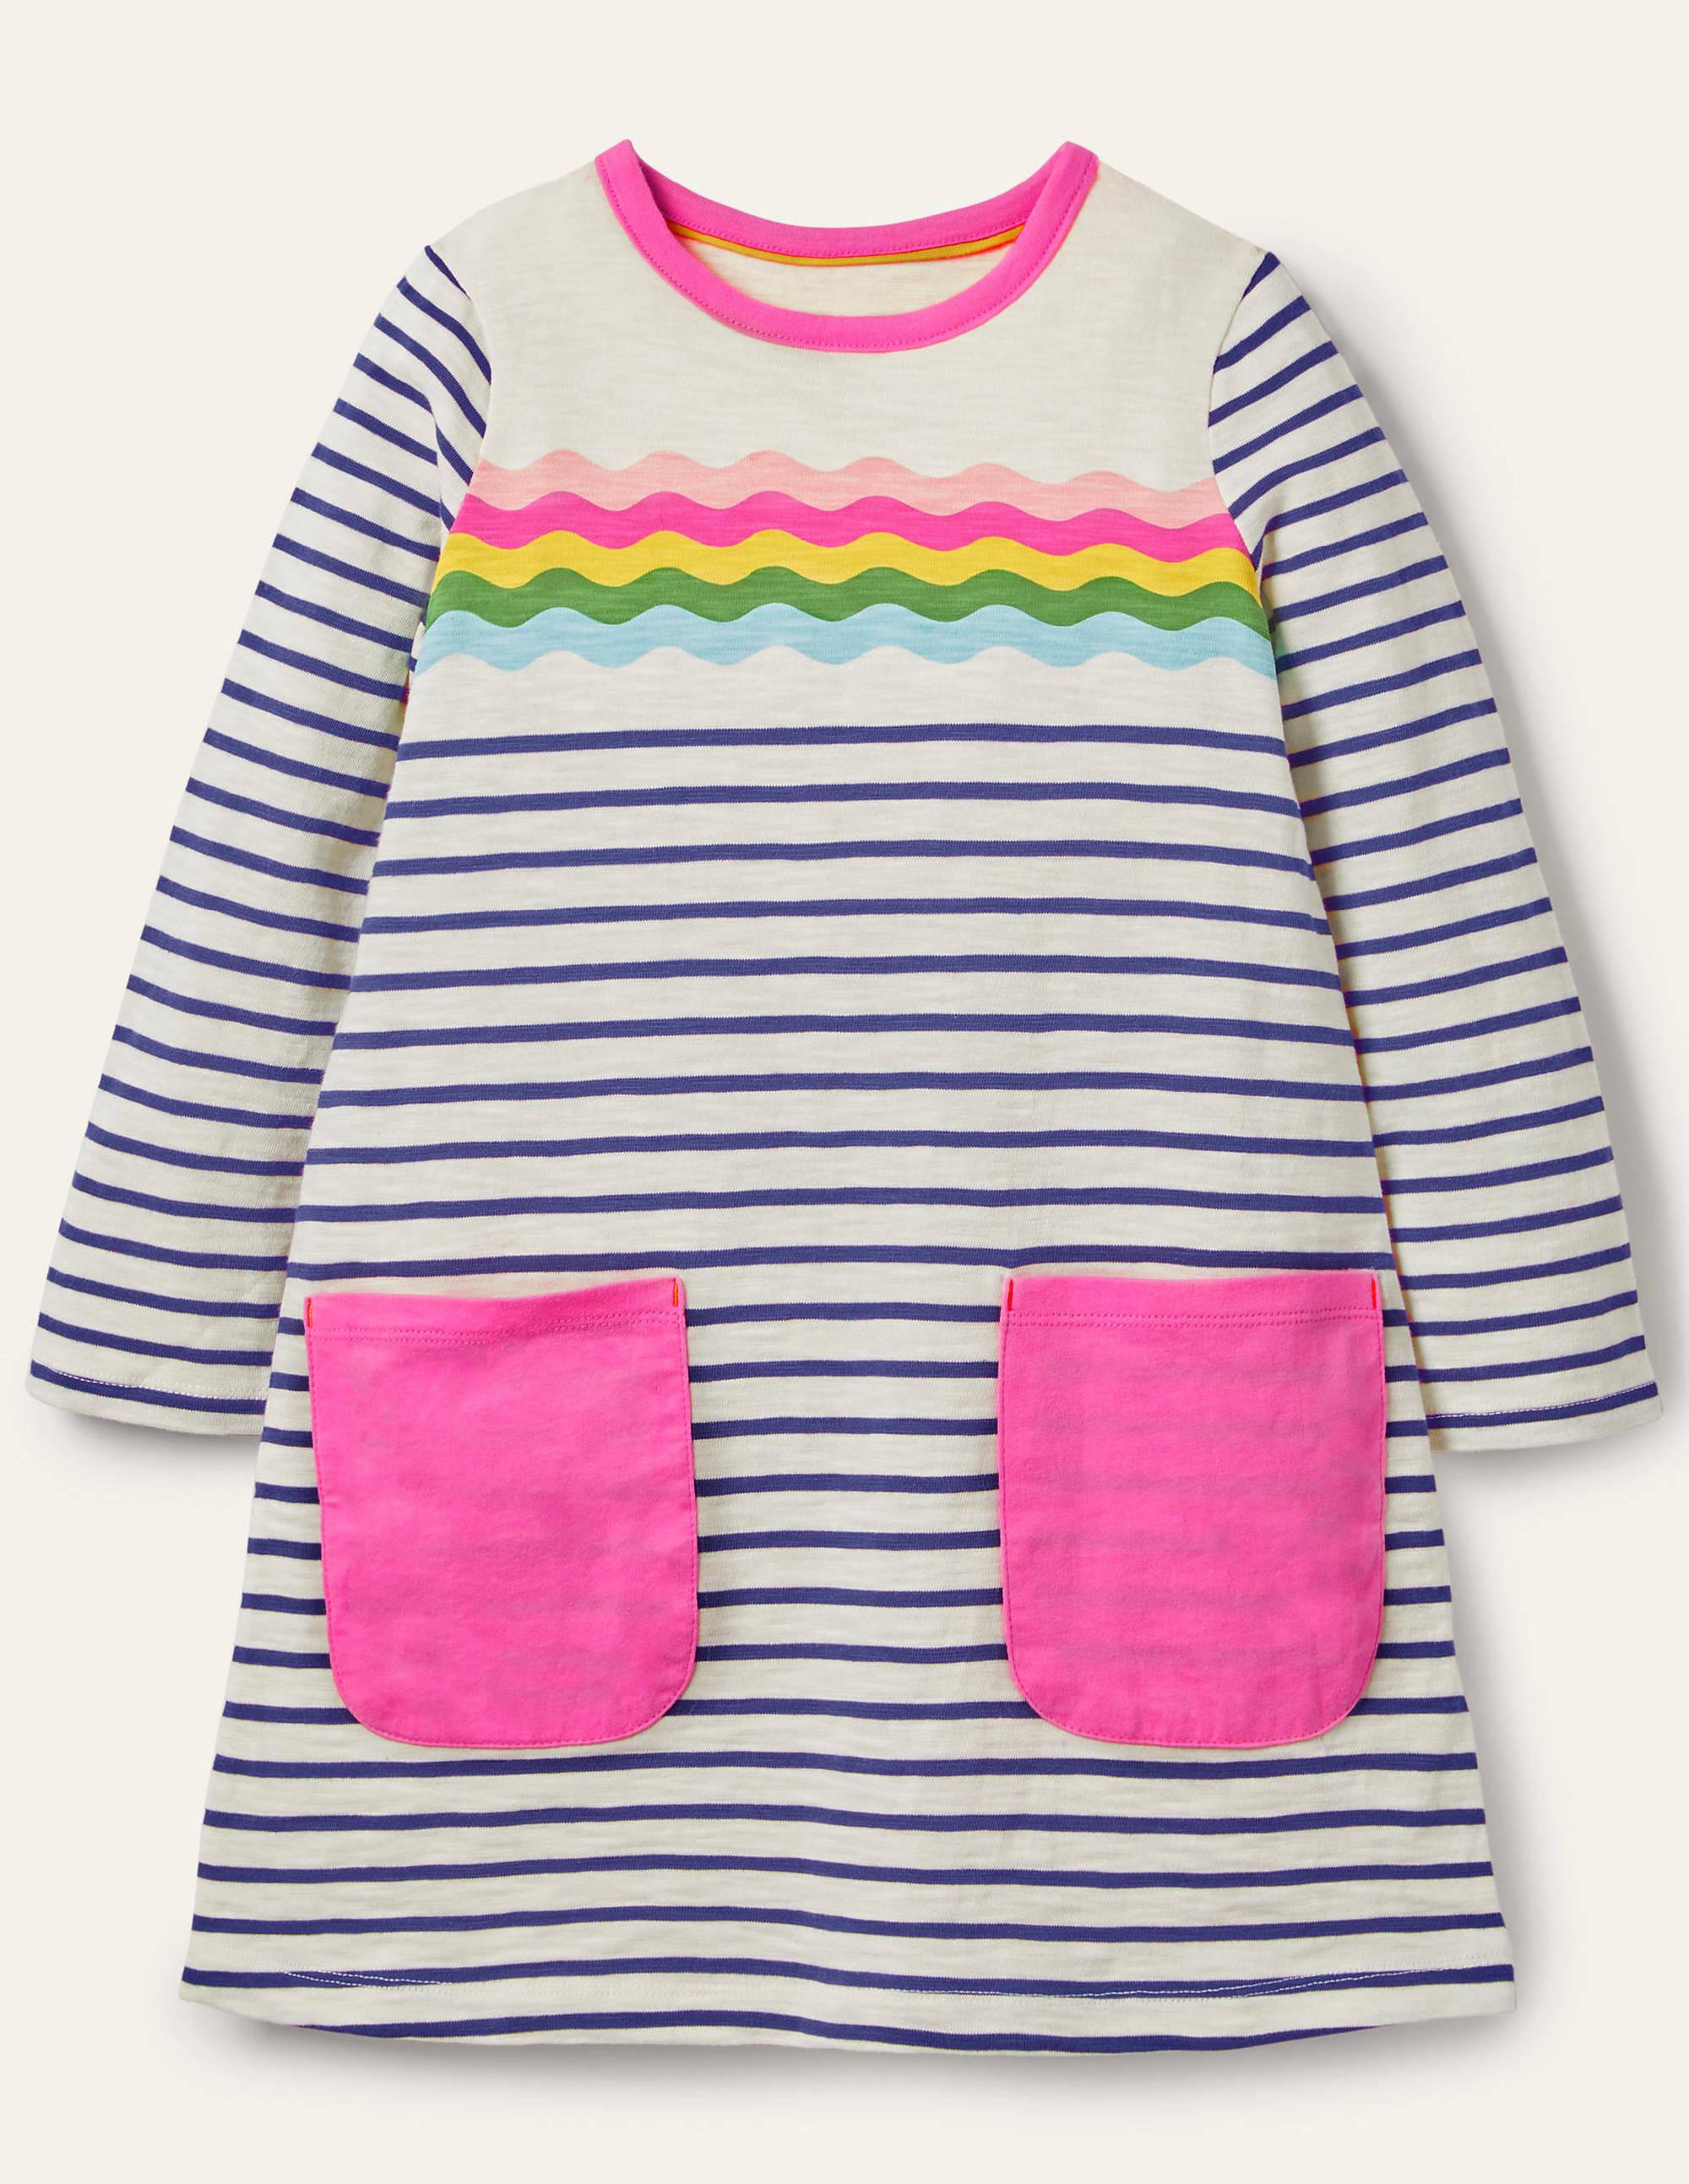 Boden Fun Pocket Jersey Dress - Ivory/Navy Rainbow Wave